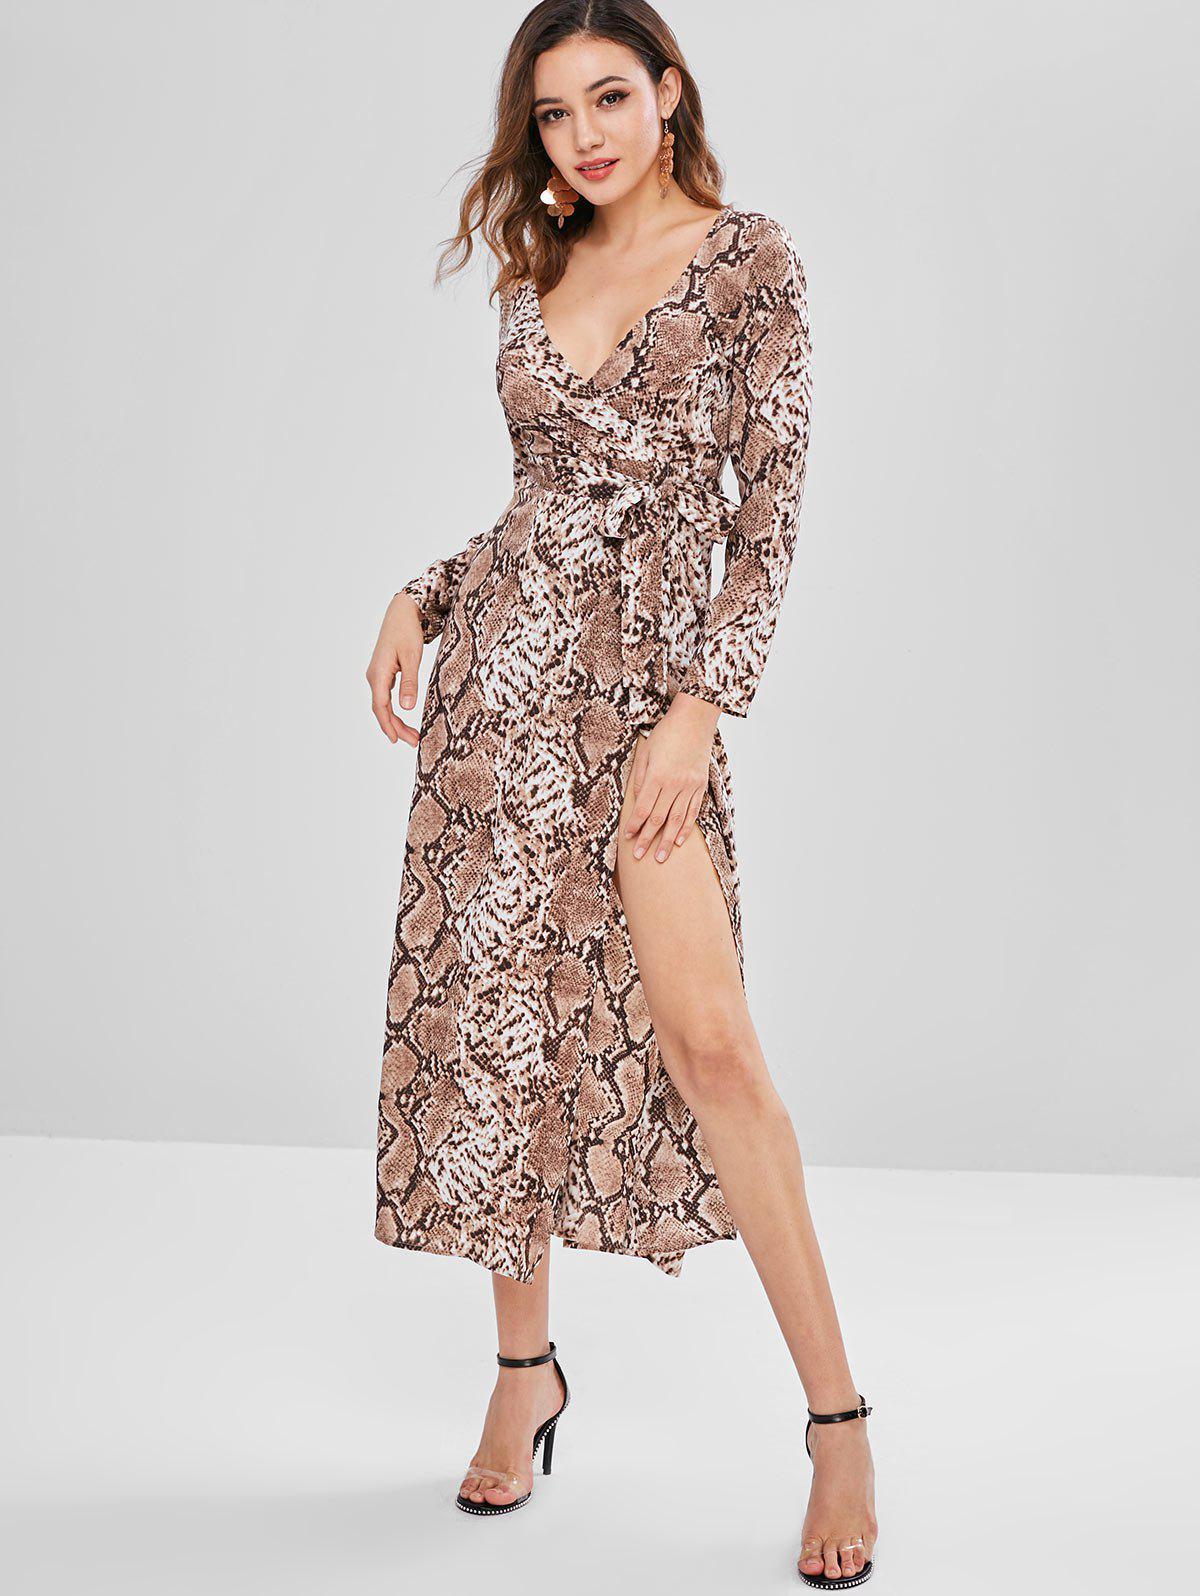 ZAFUL Snakeskin Print Belted Surplice Dress, Multi